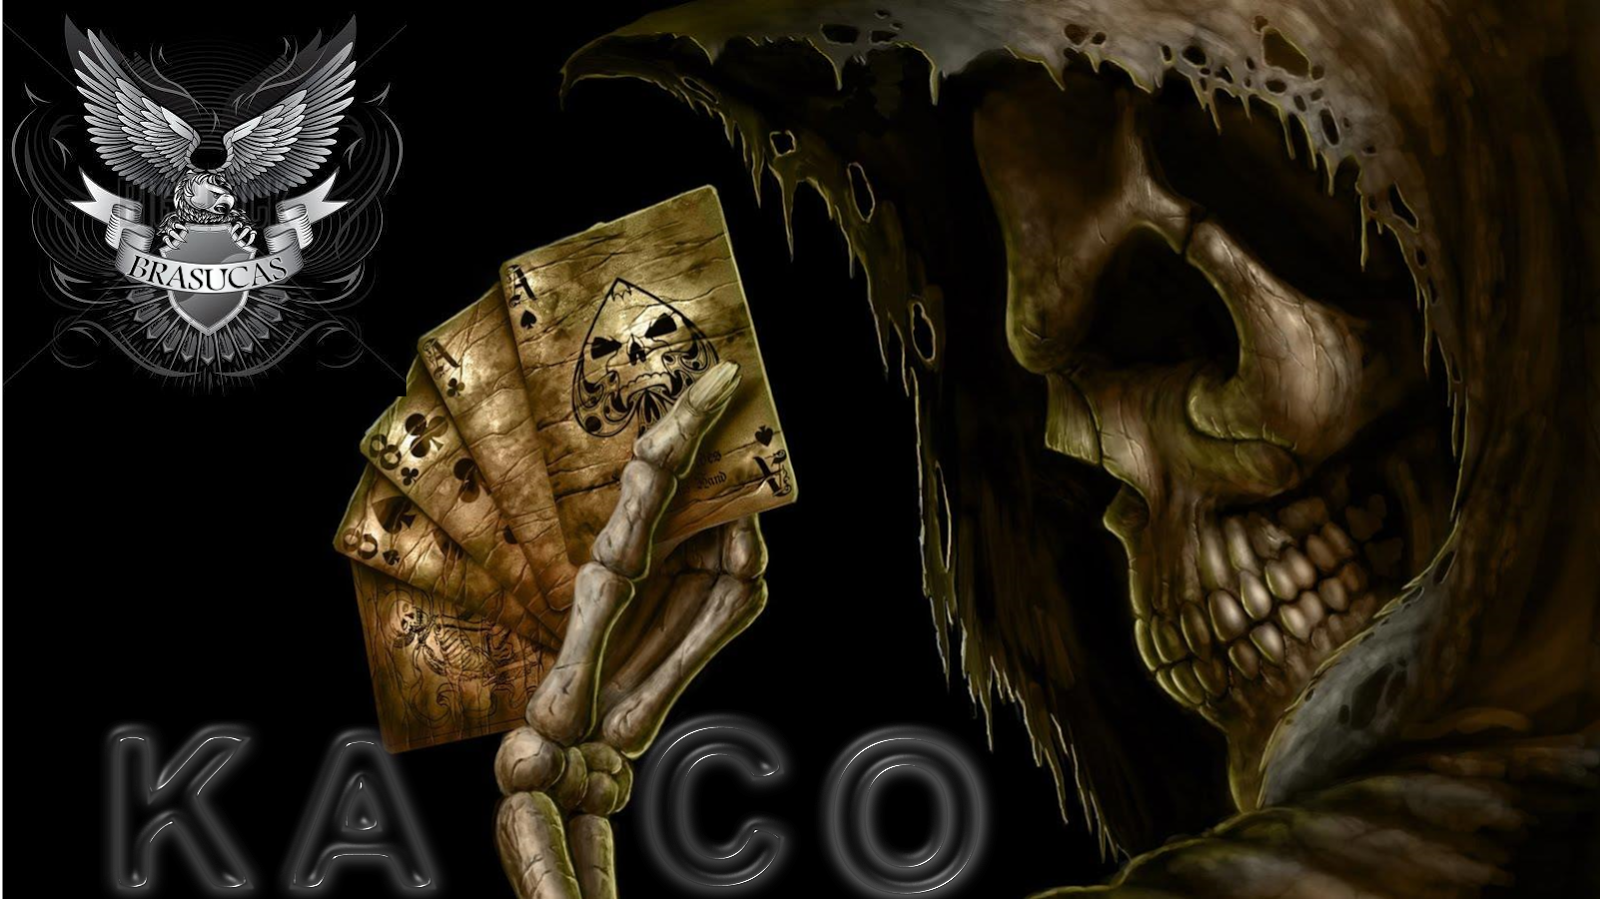 http://1.bp.blogspot.com/-HswkGfAikoI/VQ3b0T-IaeI/AAAAAAAAA8A/LOYJGwxV-y8/s1600/KKAACO.png